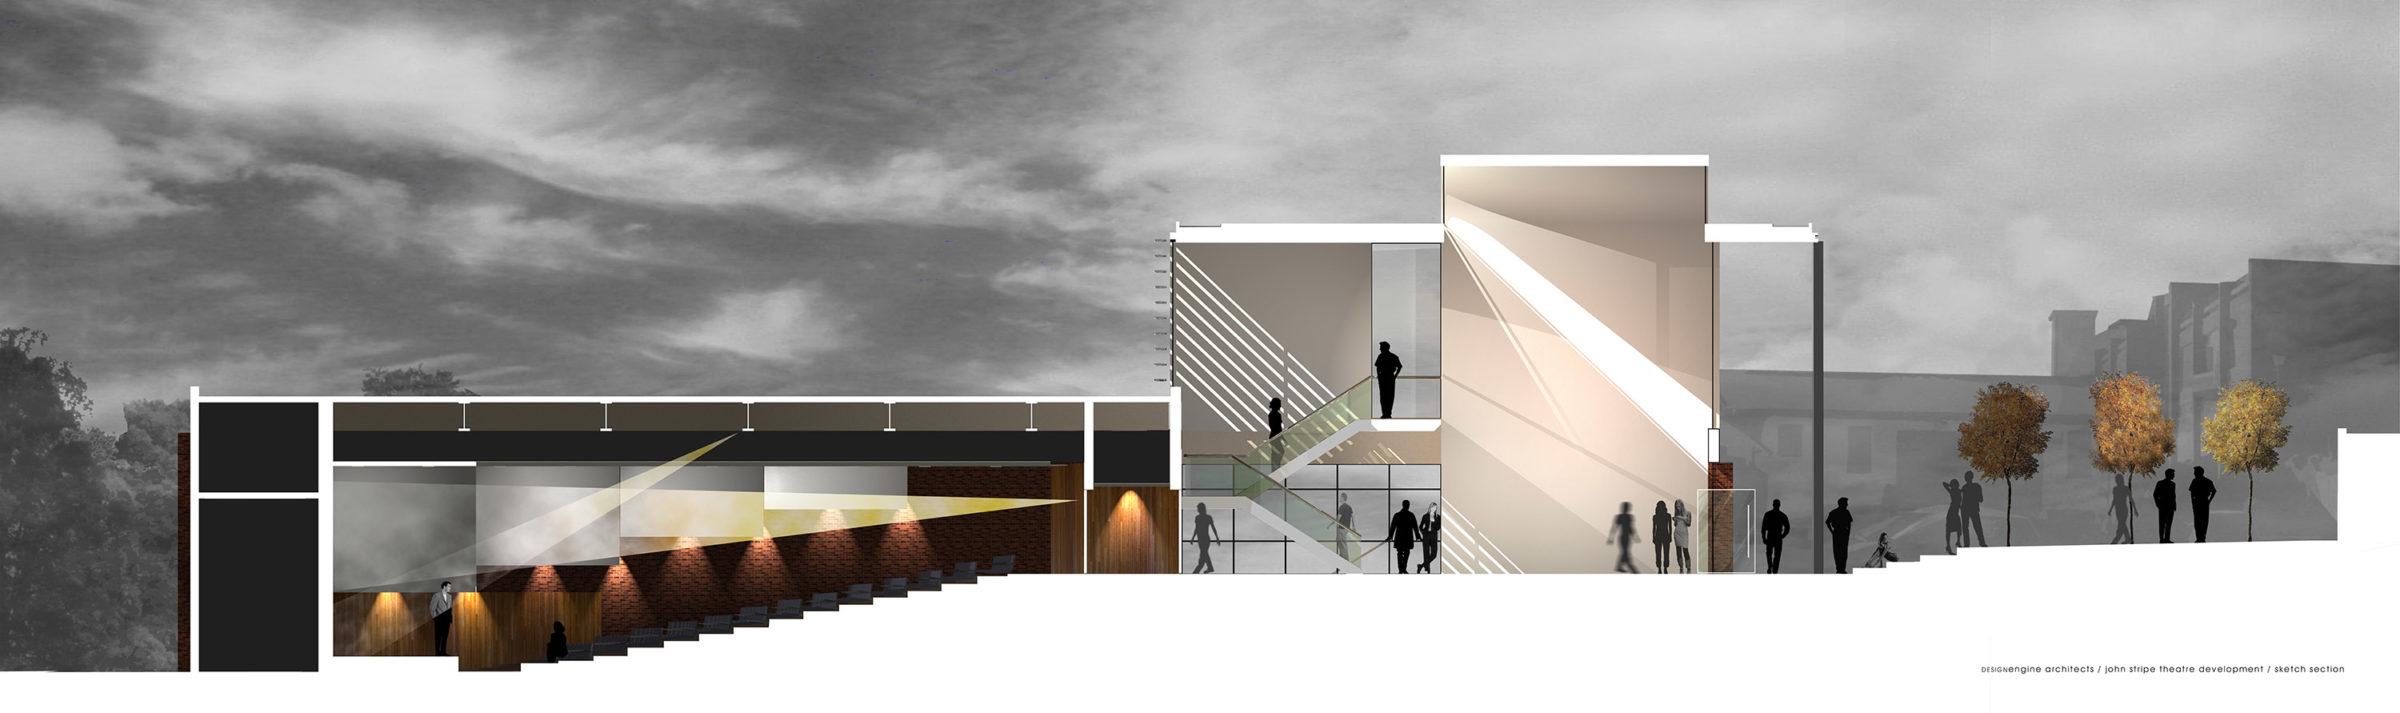 Design Engine Stripe Lecture Theatre Visualisation